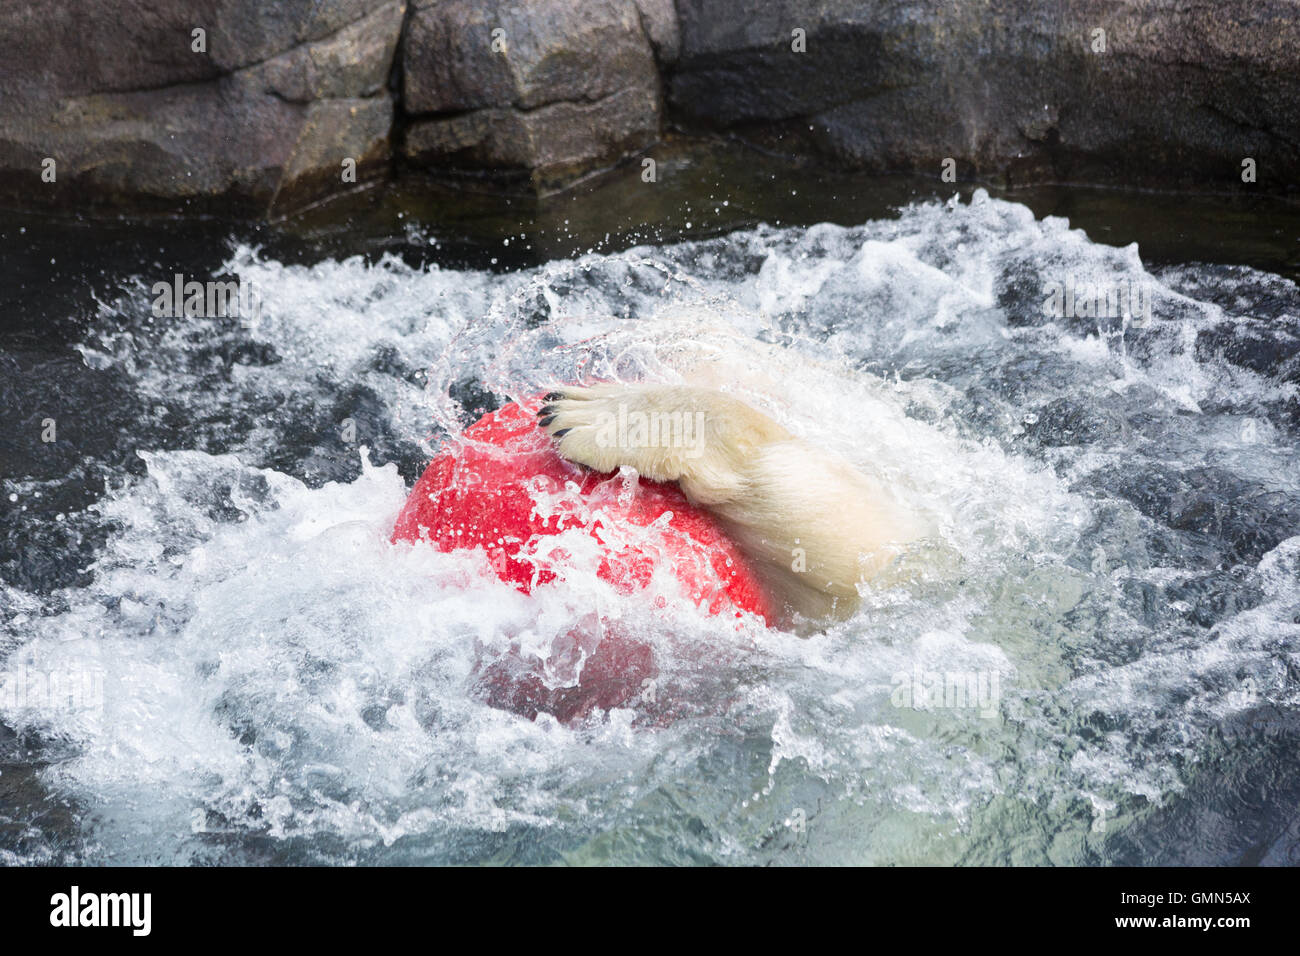 Thalarctos Maritimus (Ursus maritimus) commonly known as Polar bear - Stock Image